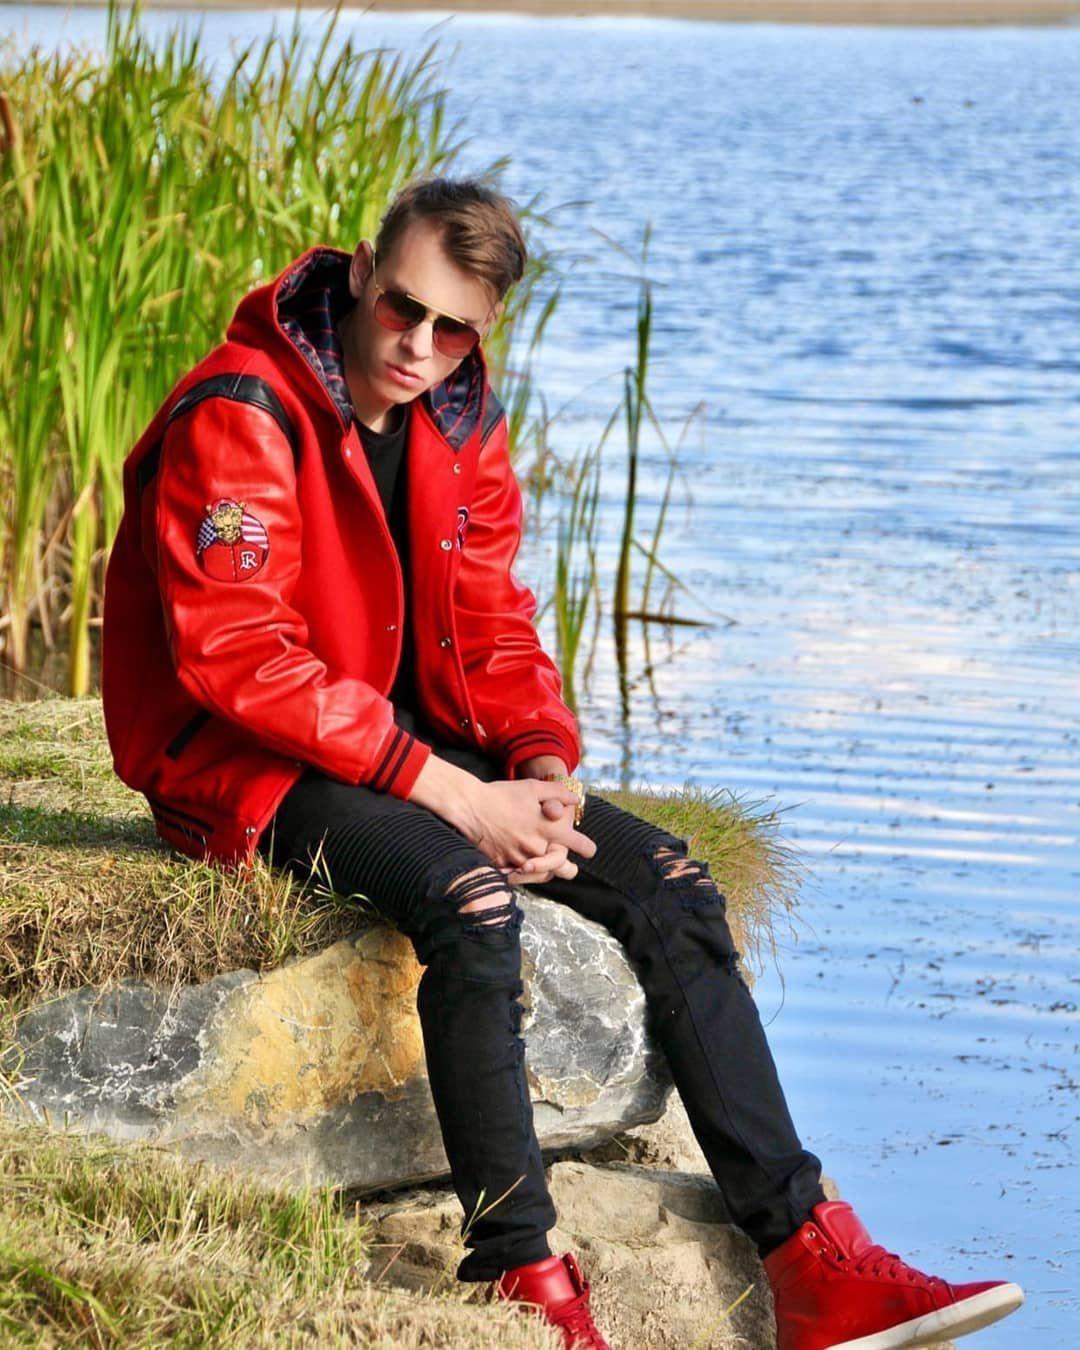 Red varsity jacket tyga b ... #varsityjacketoutfit Red varsity jacket tyga b ... #varsityjacketoutfit